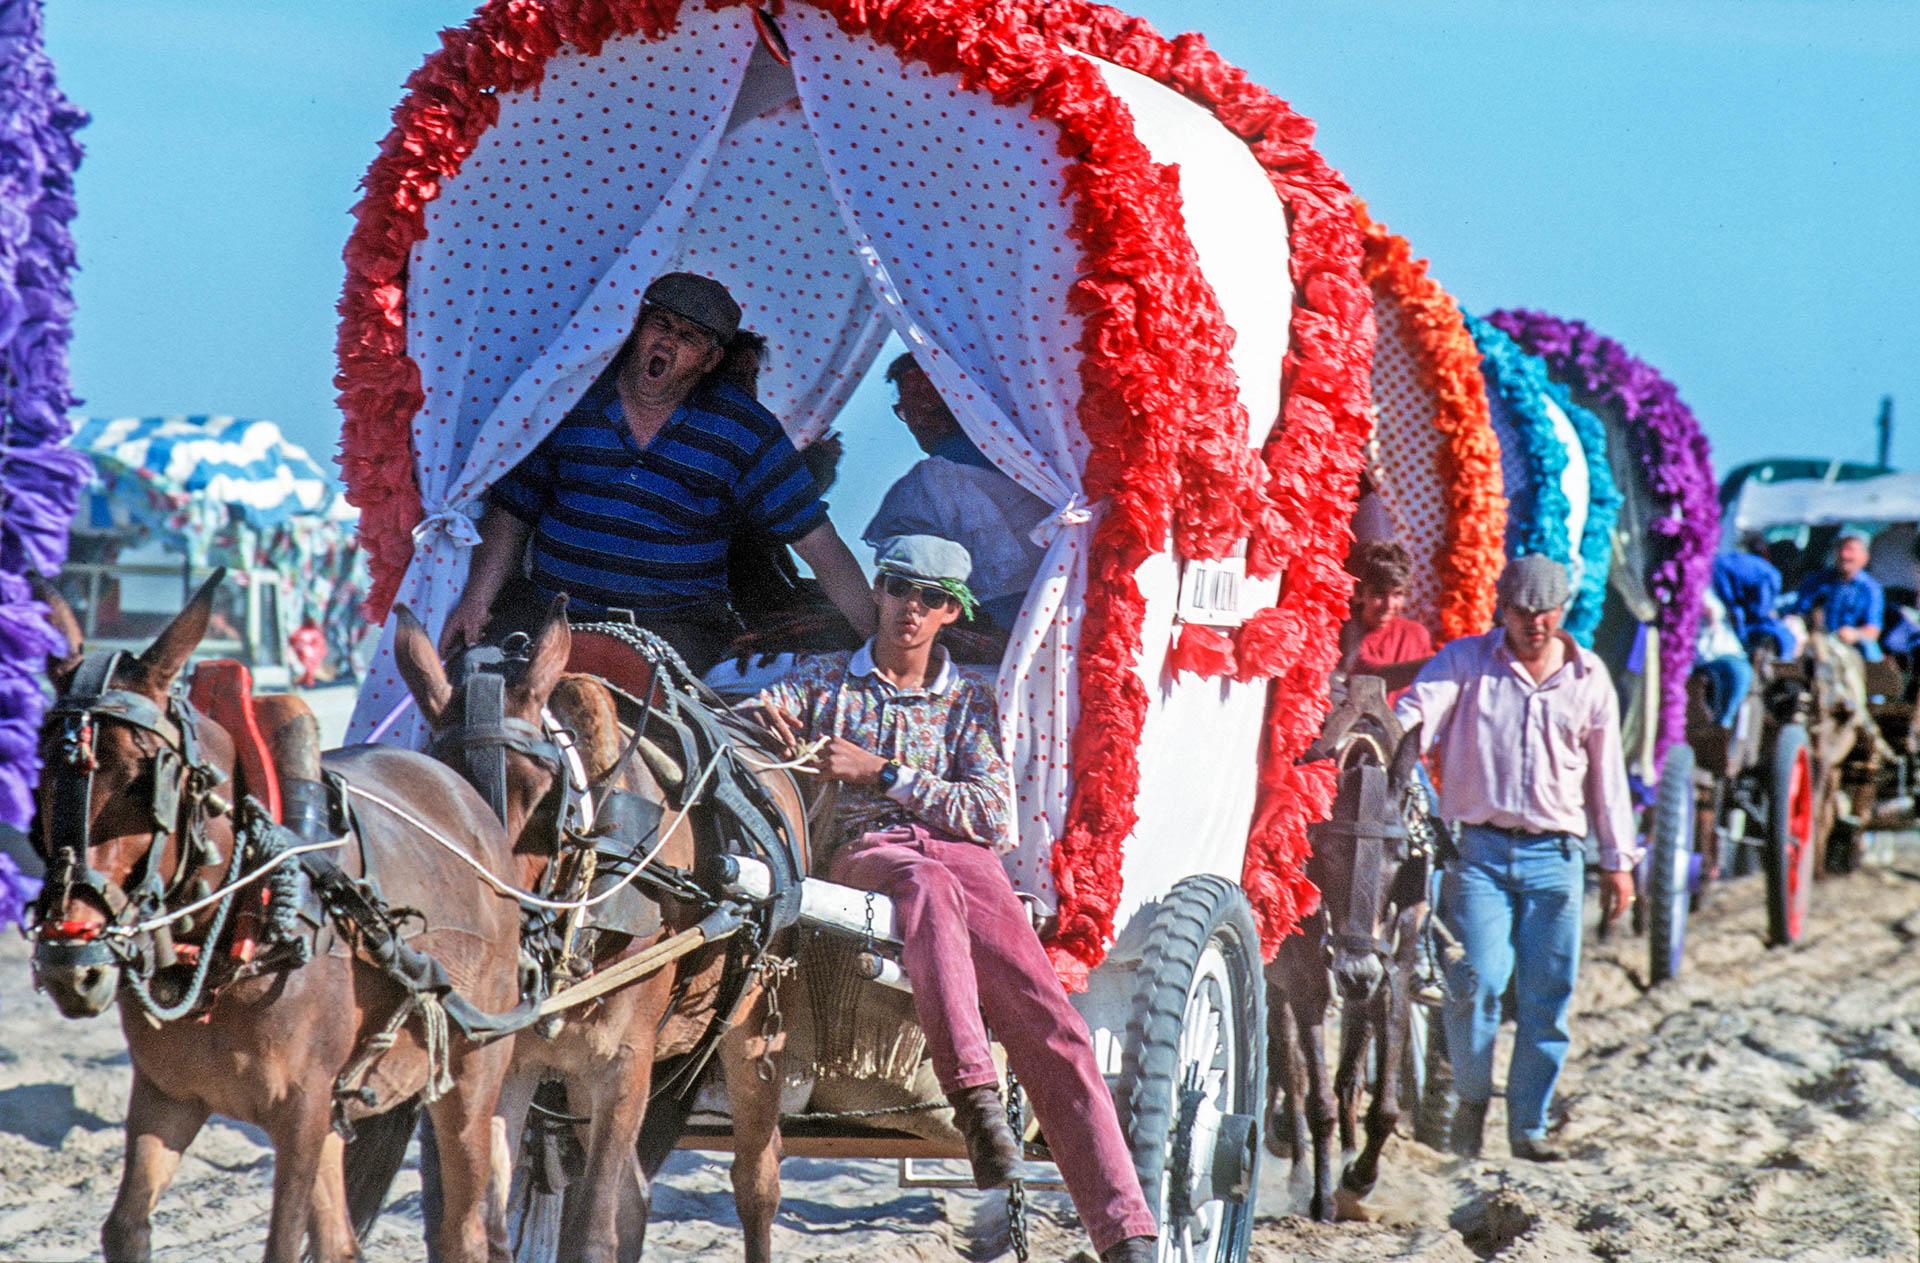 The miracle around the world: El Rocio, the caravans cross the Donana park.